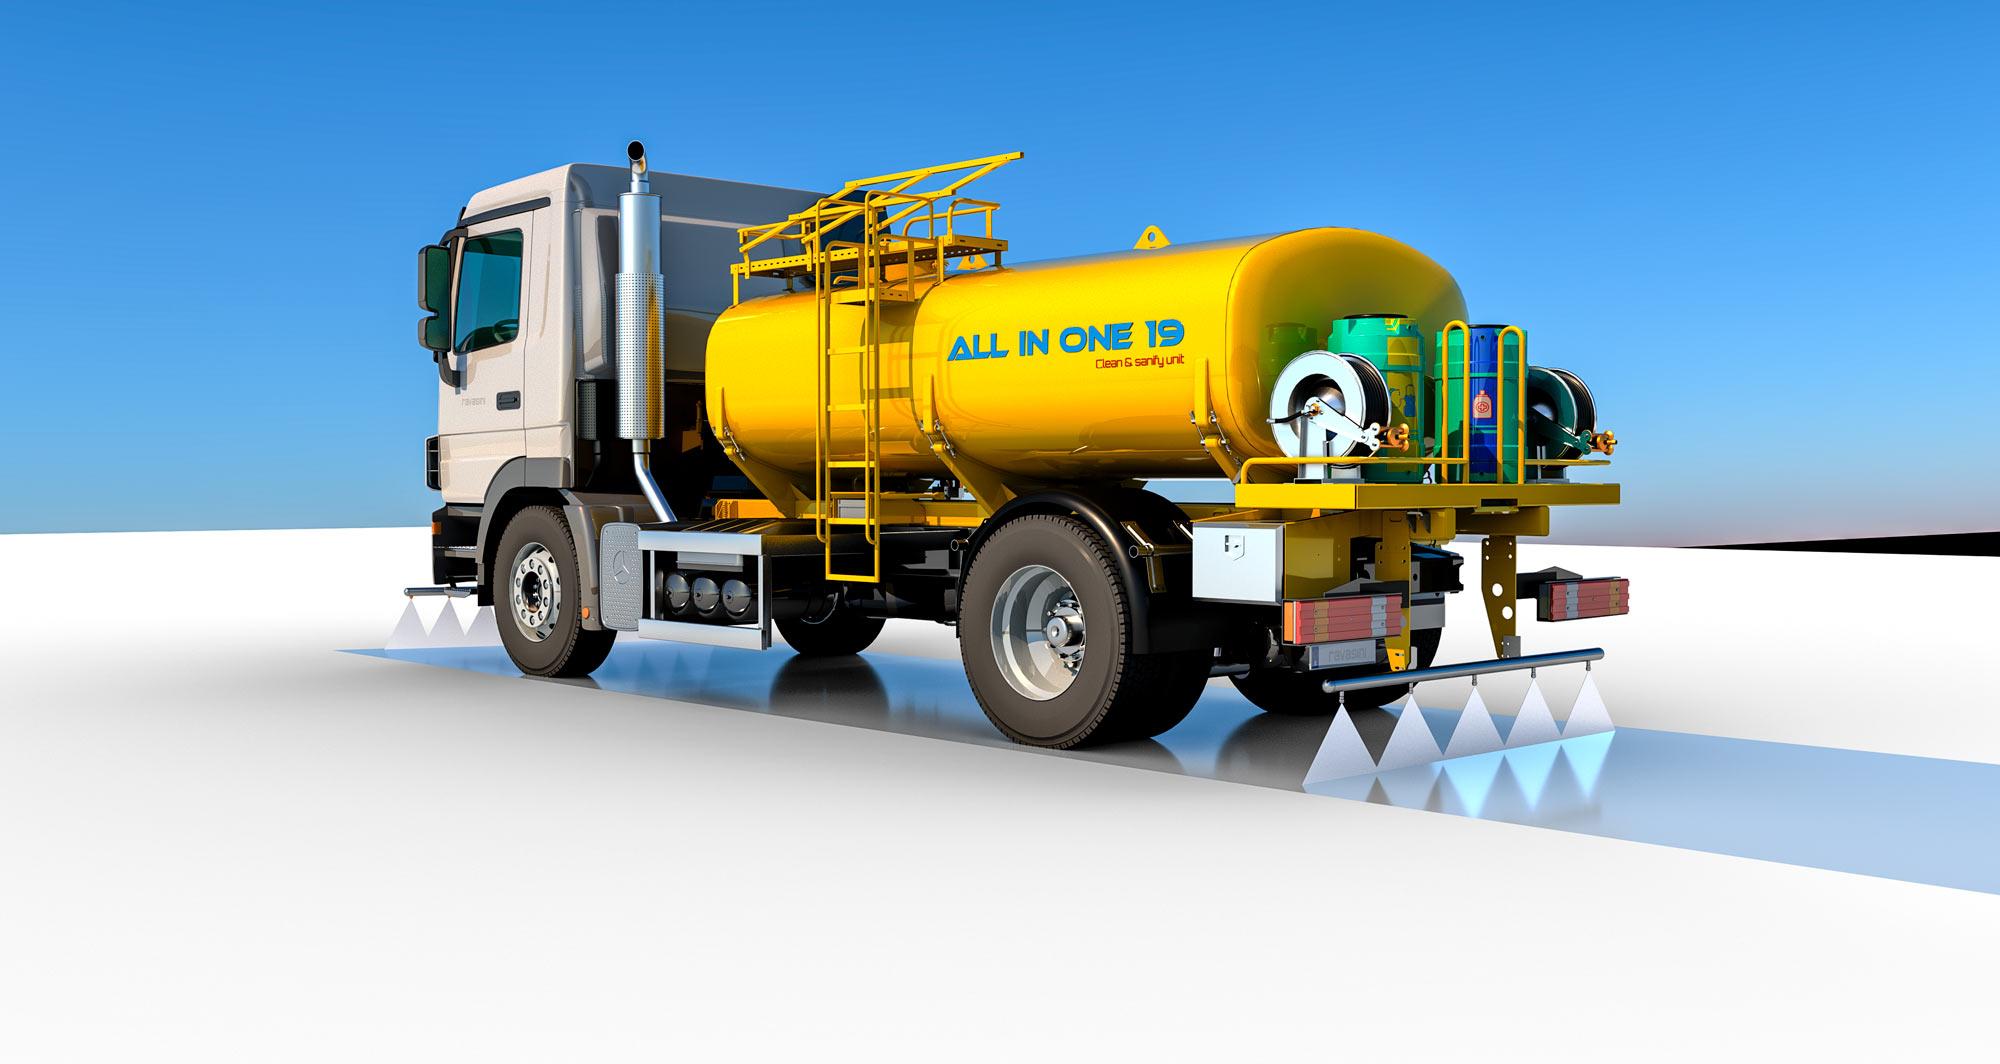 Ravasini_clean_sanify_unit_tanker_